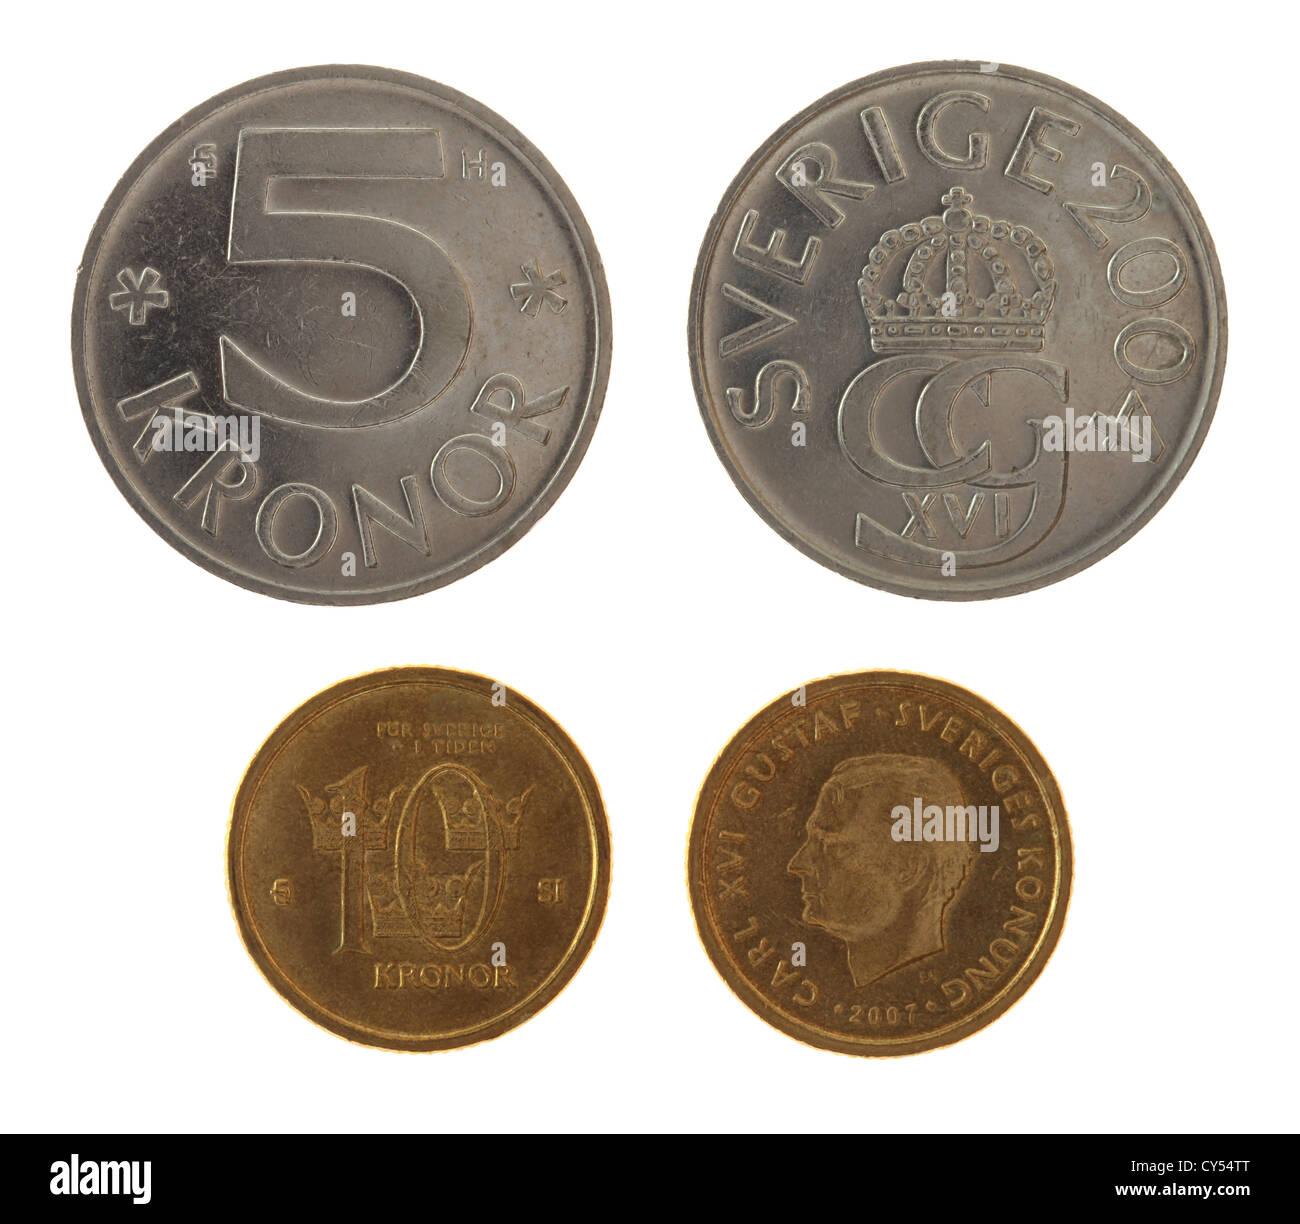 Swedish Krona Coins Depicting Carl Xvi Gustaf Of Sweden Obverse And